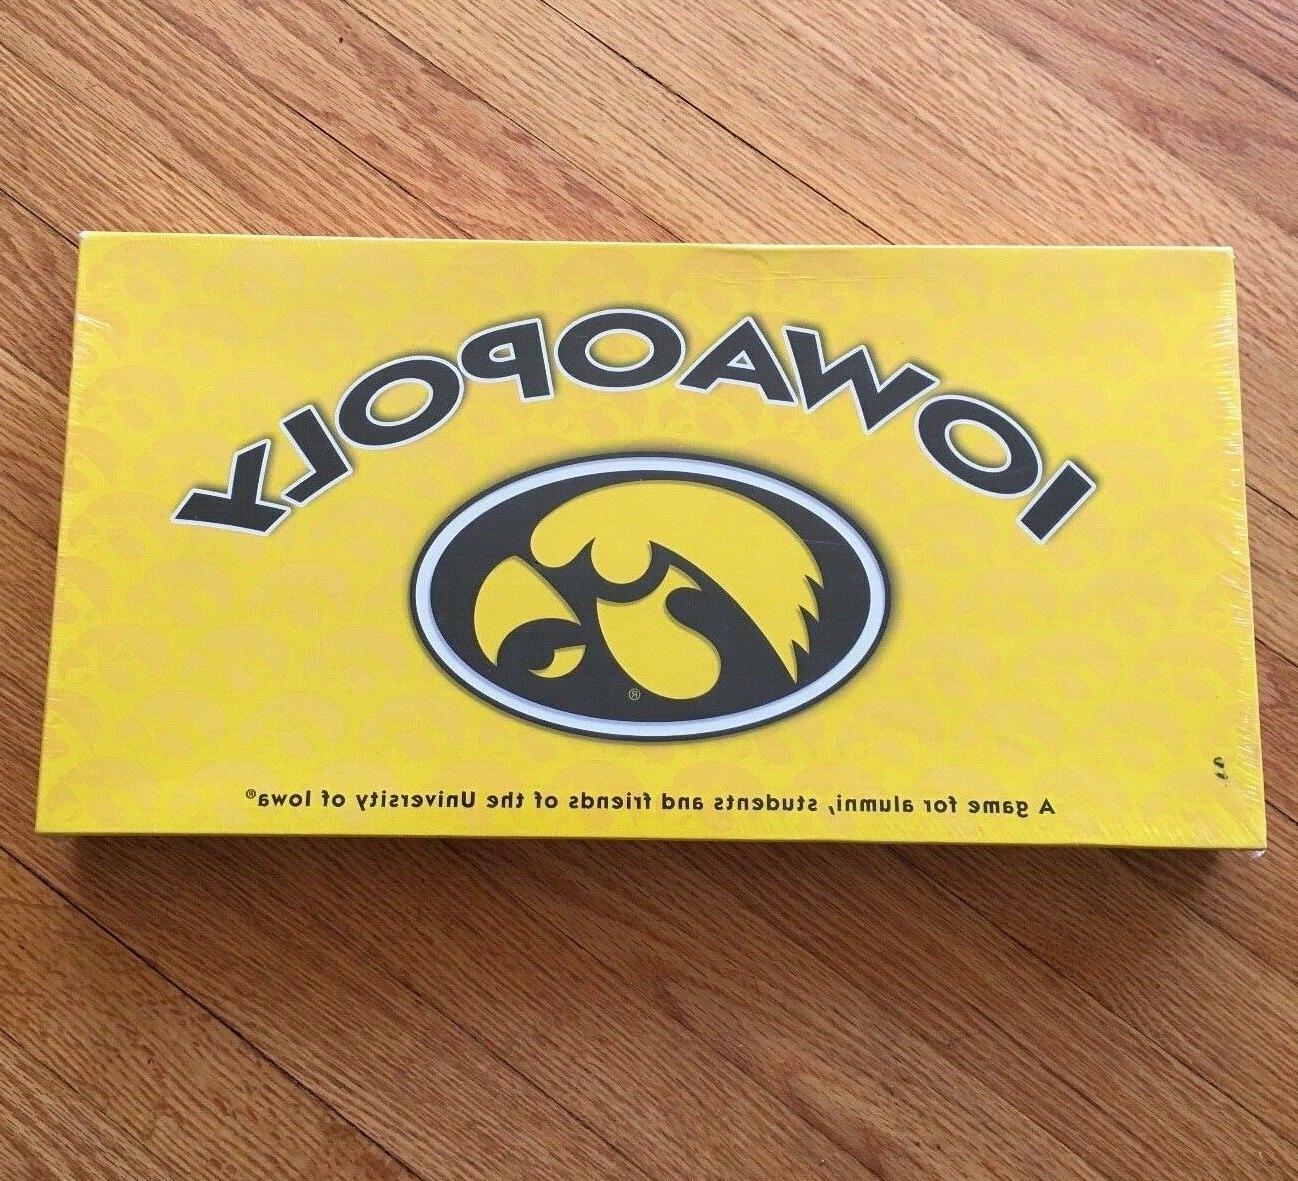 iowaopoly university of iowa hawkeyes board game